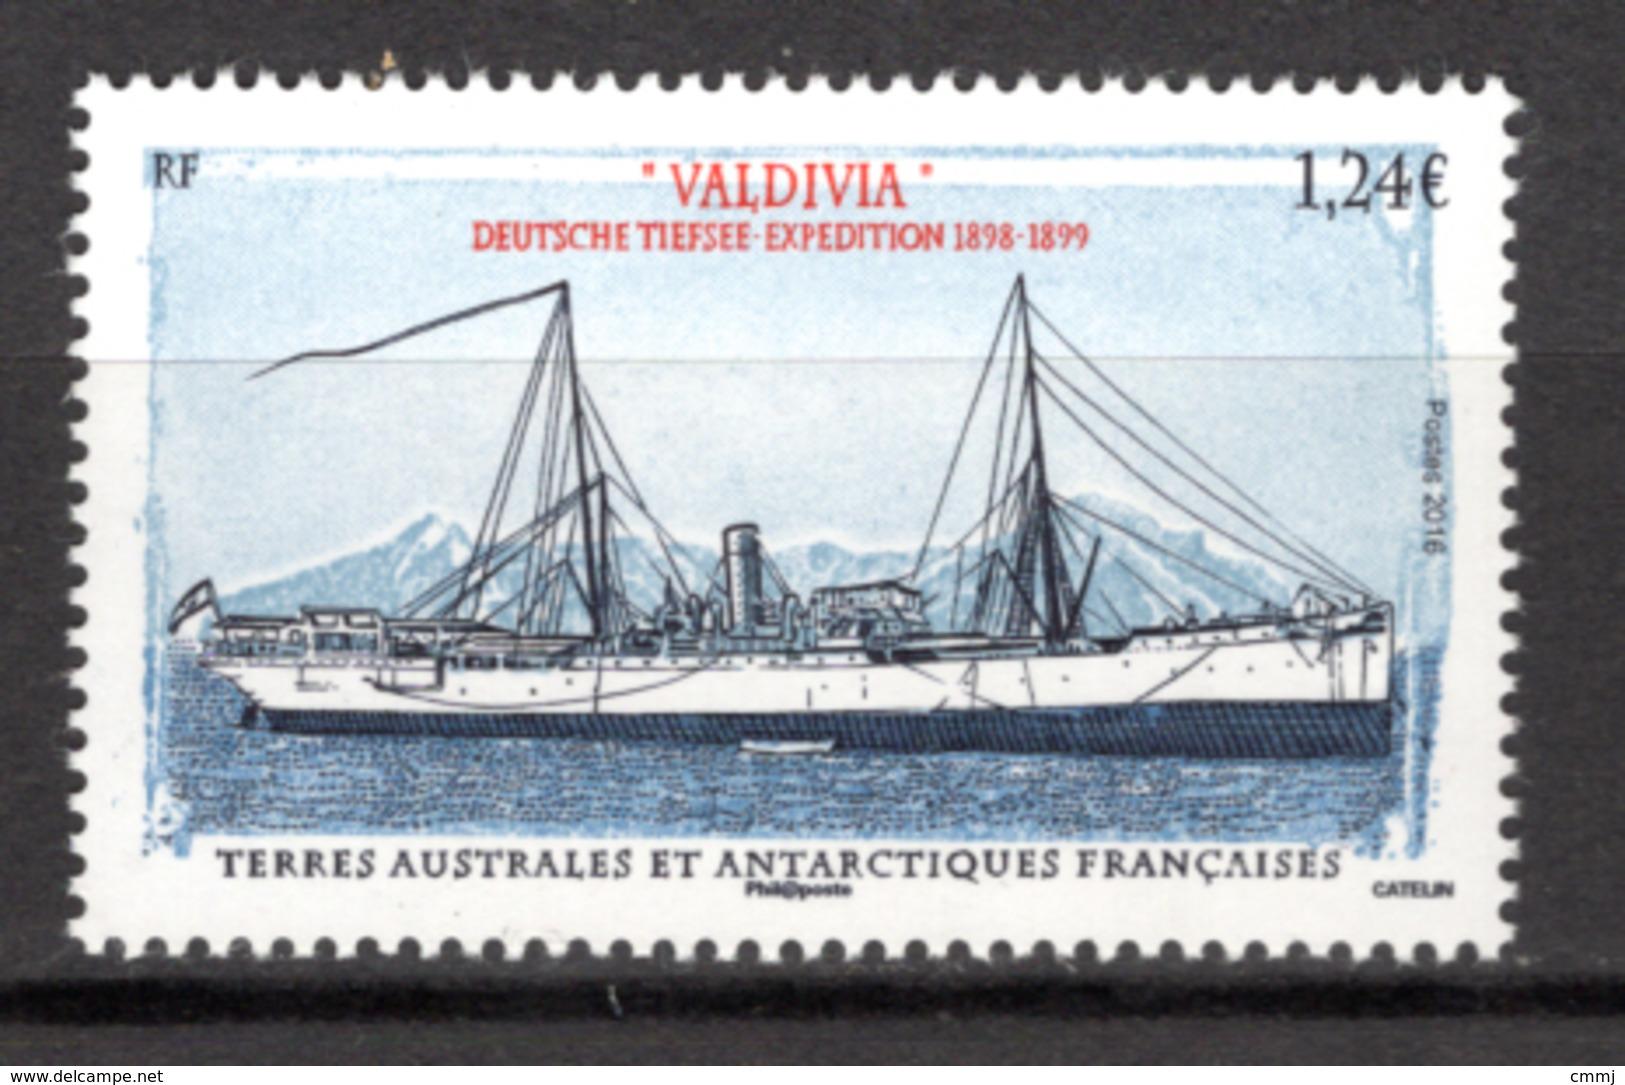 TAAF - 2016 - TERRE AUSTRALIANE E ANTARTICO FRANC. -  Mi. Nr.  924 - NH - (CW4755.35) - Terre Australi E Antartiche Francesi (TAAF)